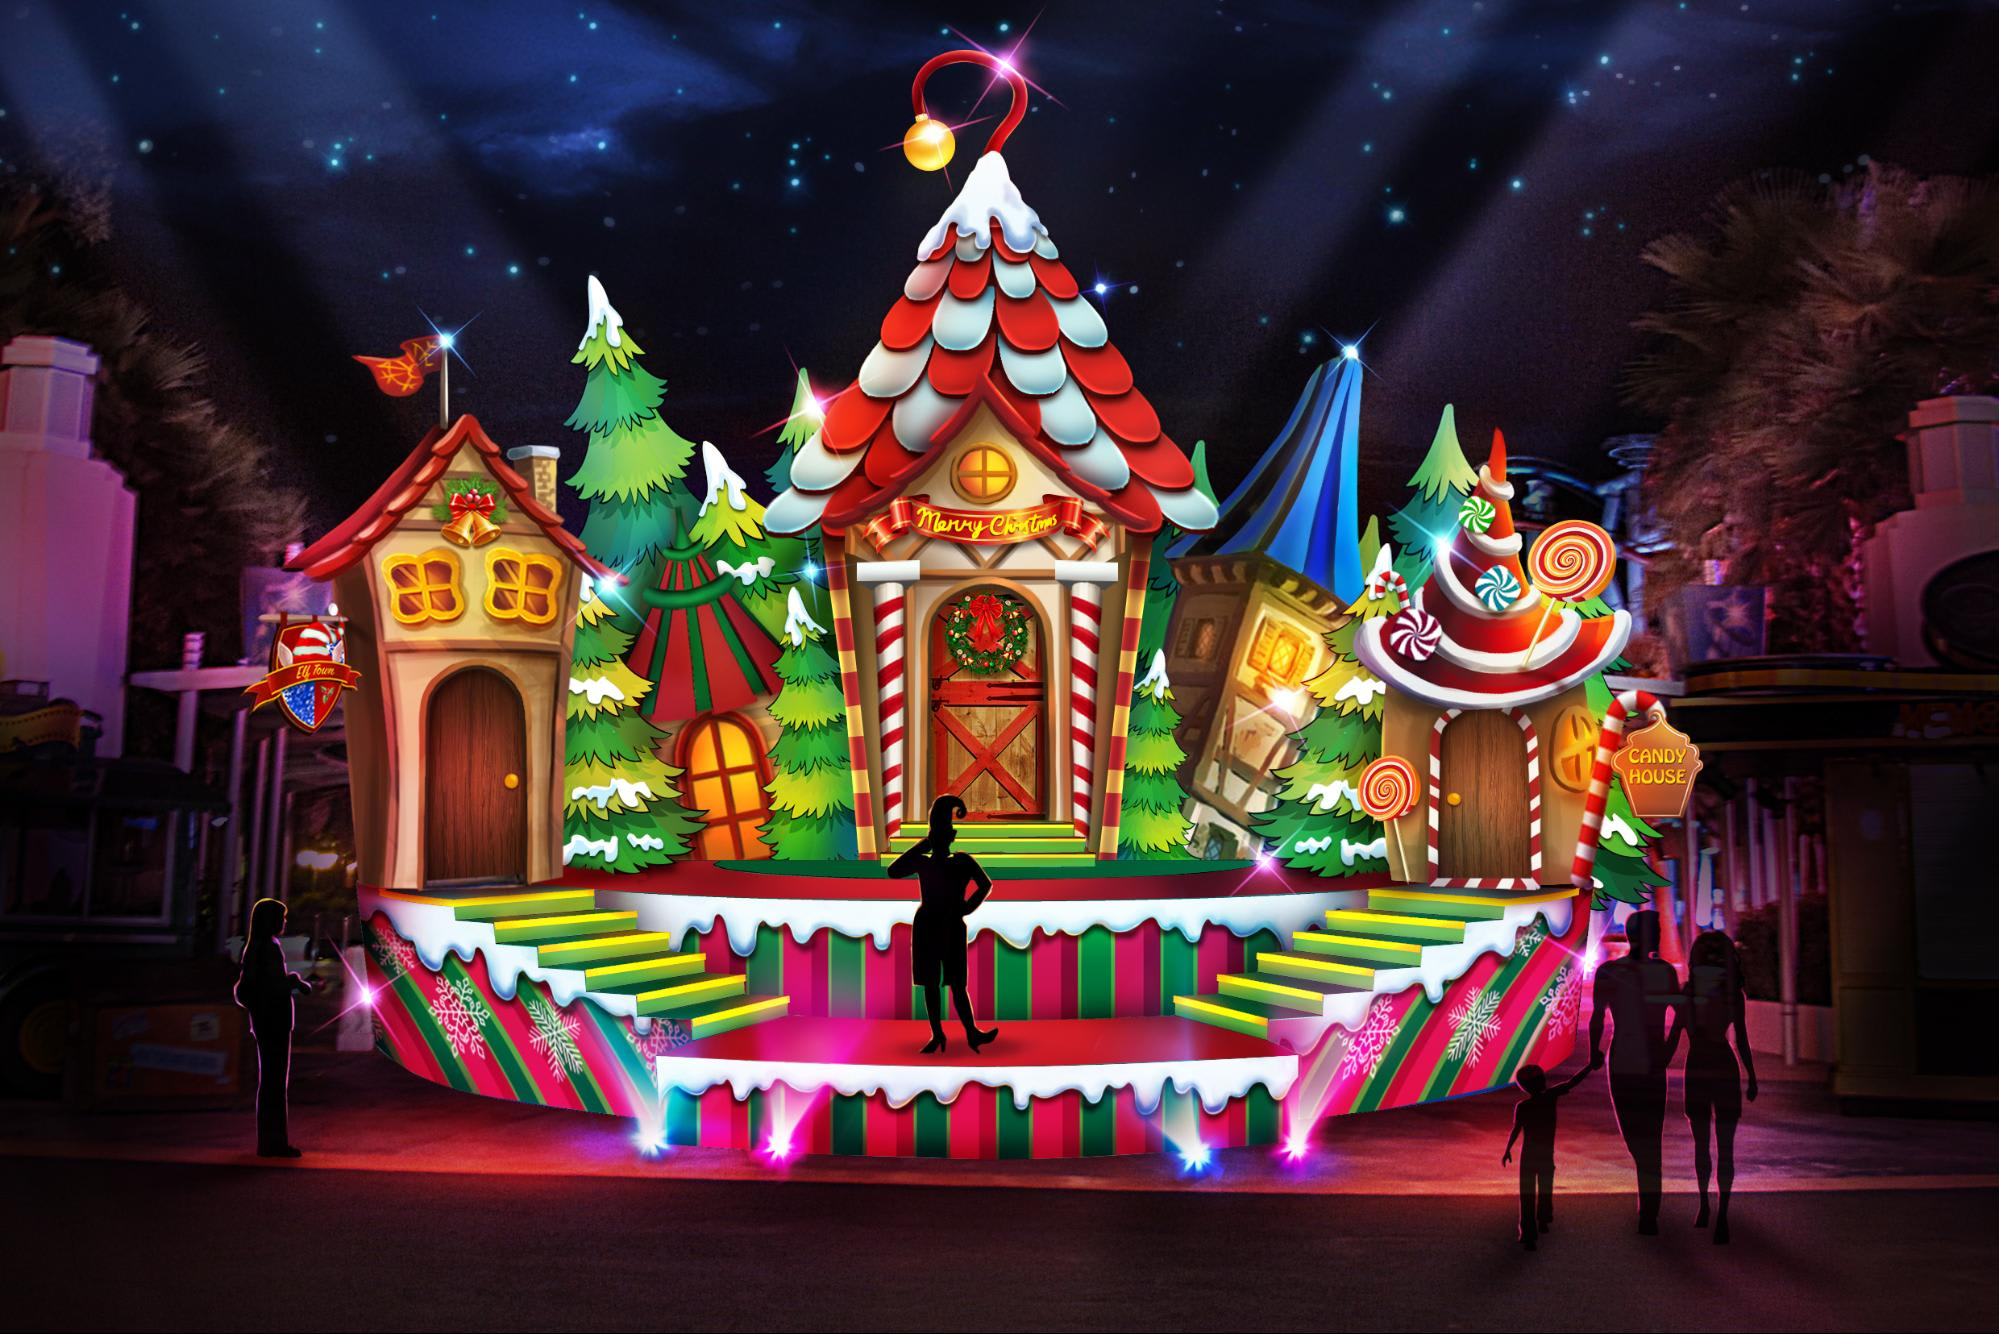 Universal Wonder Christmas 2018 Datang Ke Universal Studios